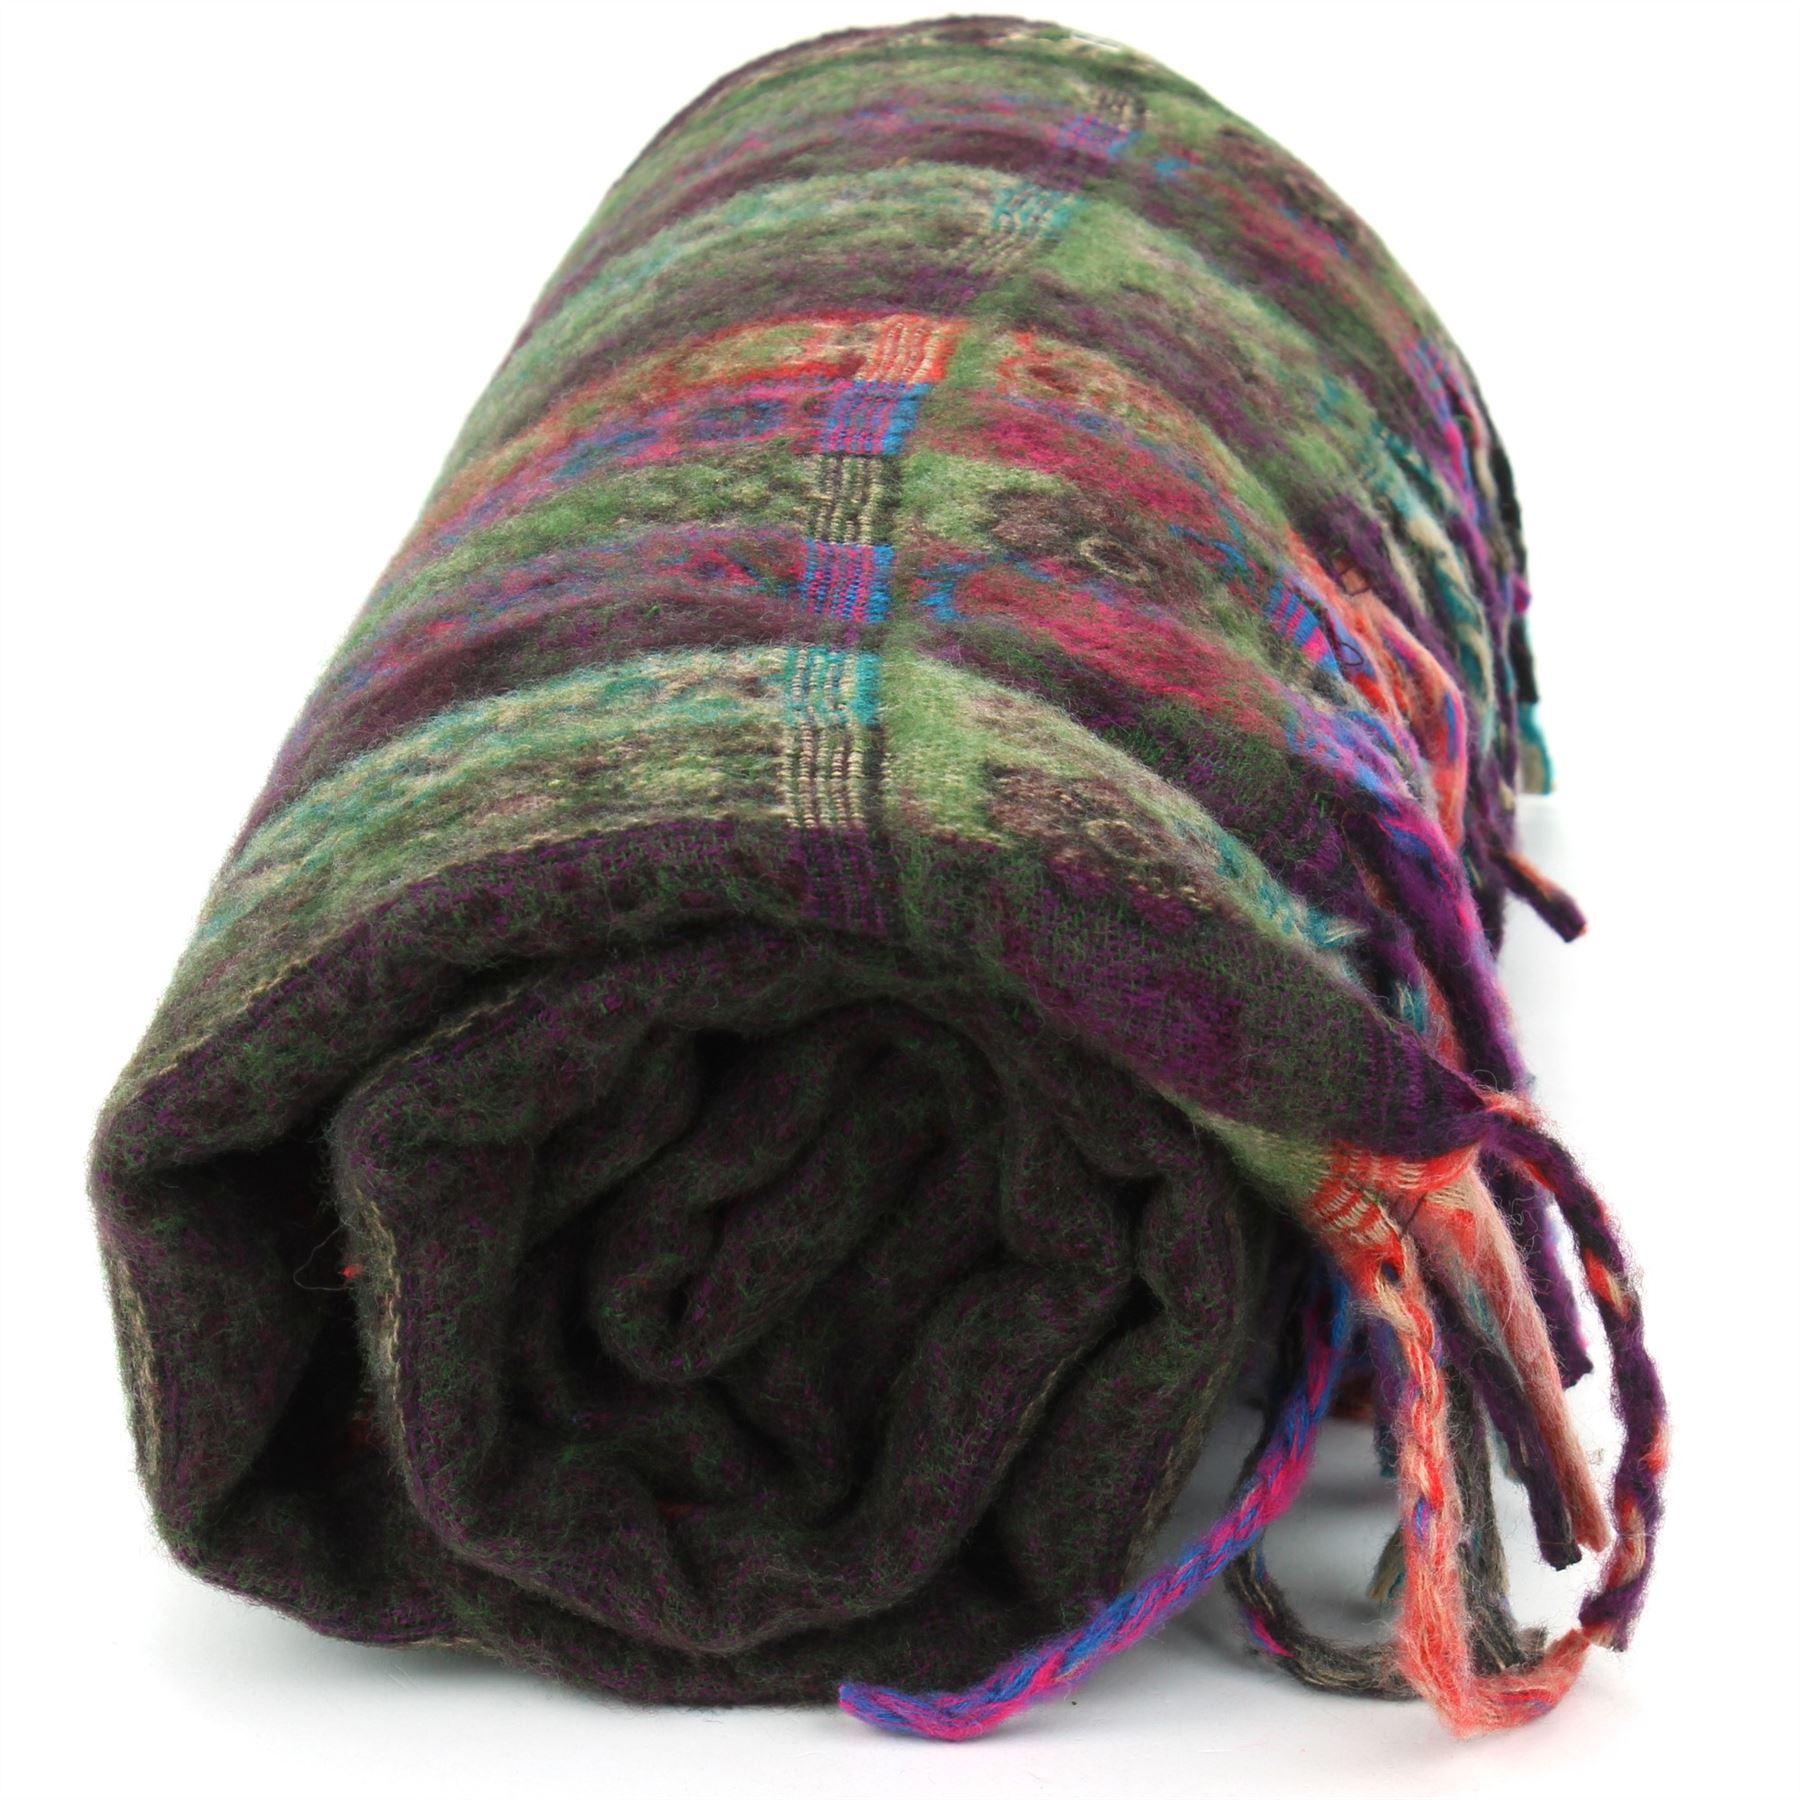 Acrylic-Wool-Blanket-Shawl-Wrap-Throw-Finest-Softest-India-Stripe-Paisley-Travel thumbnail 28